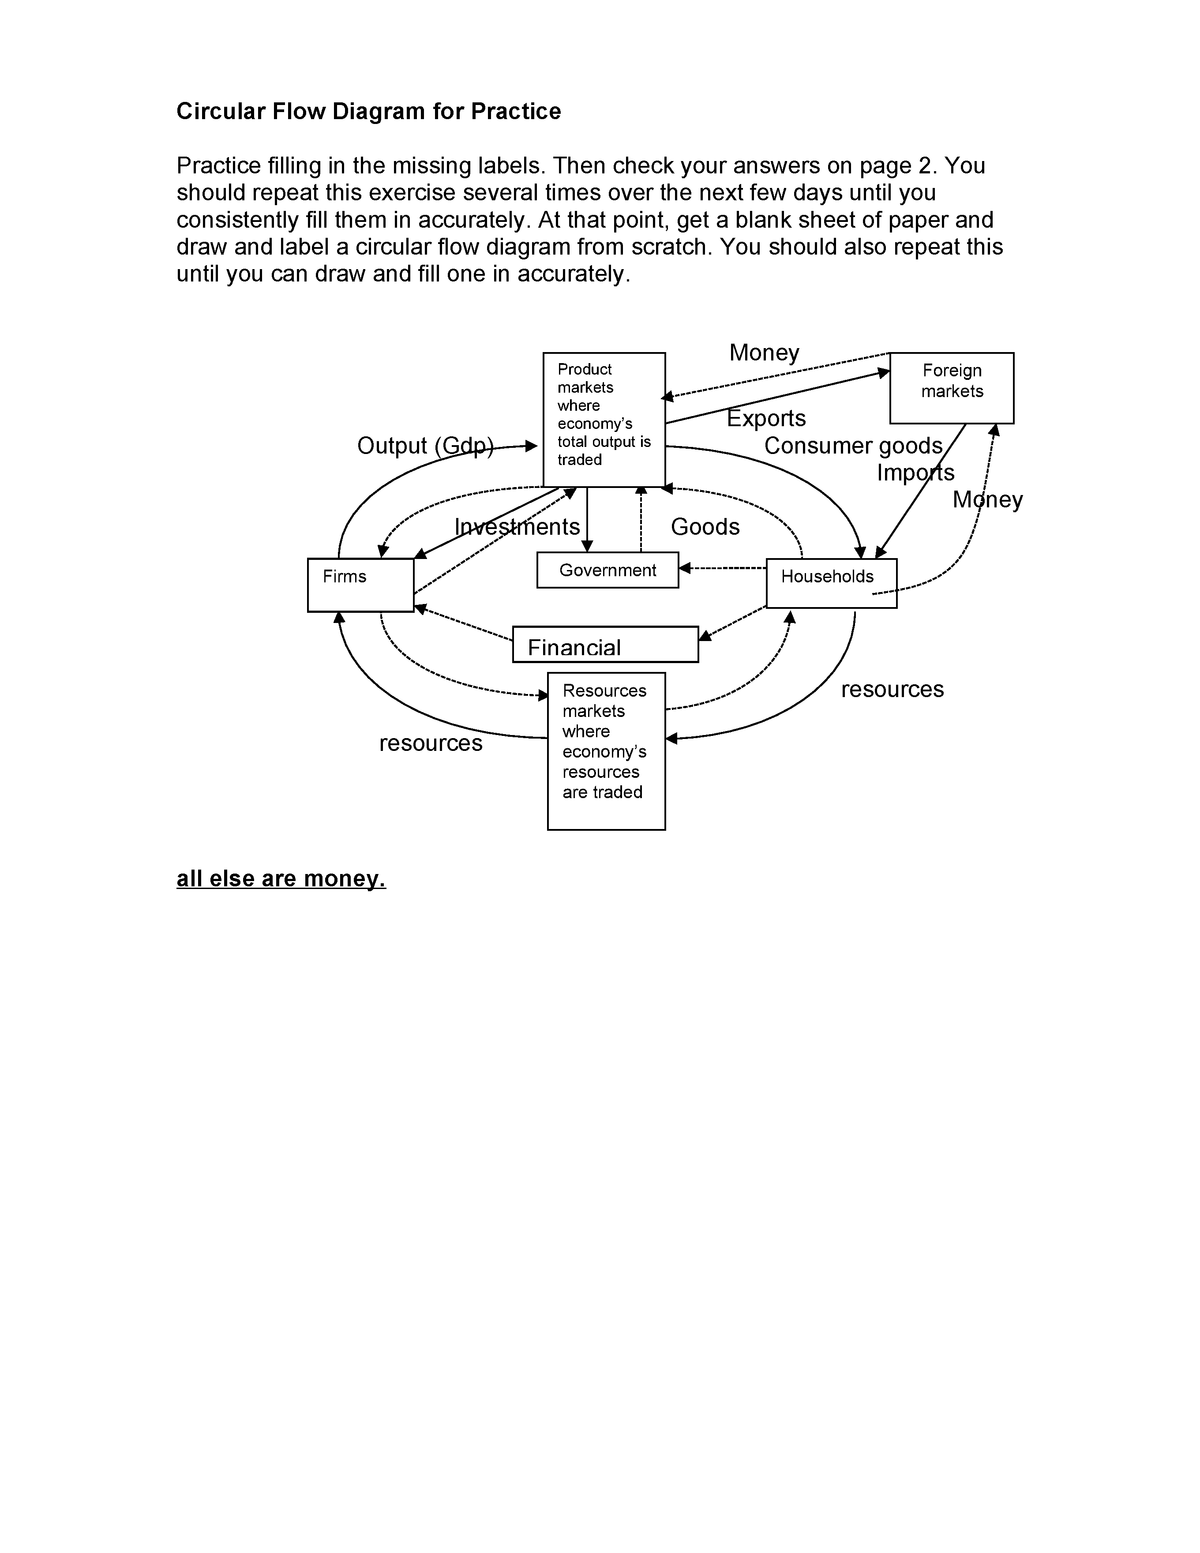 Circular Flow Diagram For Practice Econ 2305 Studocu